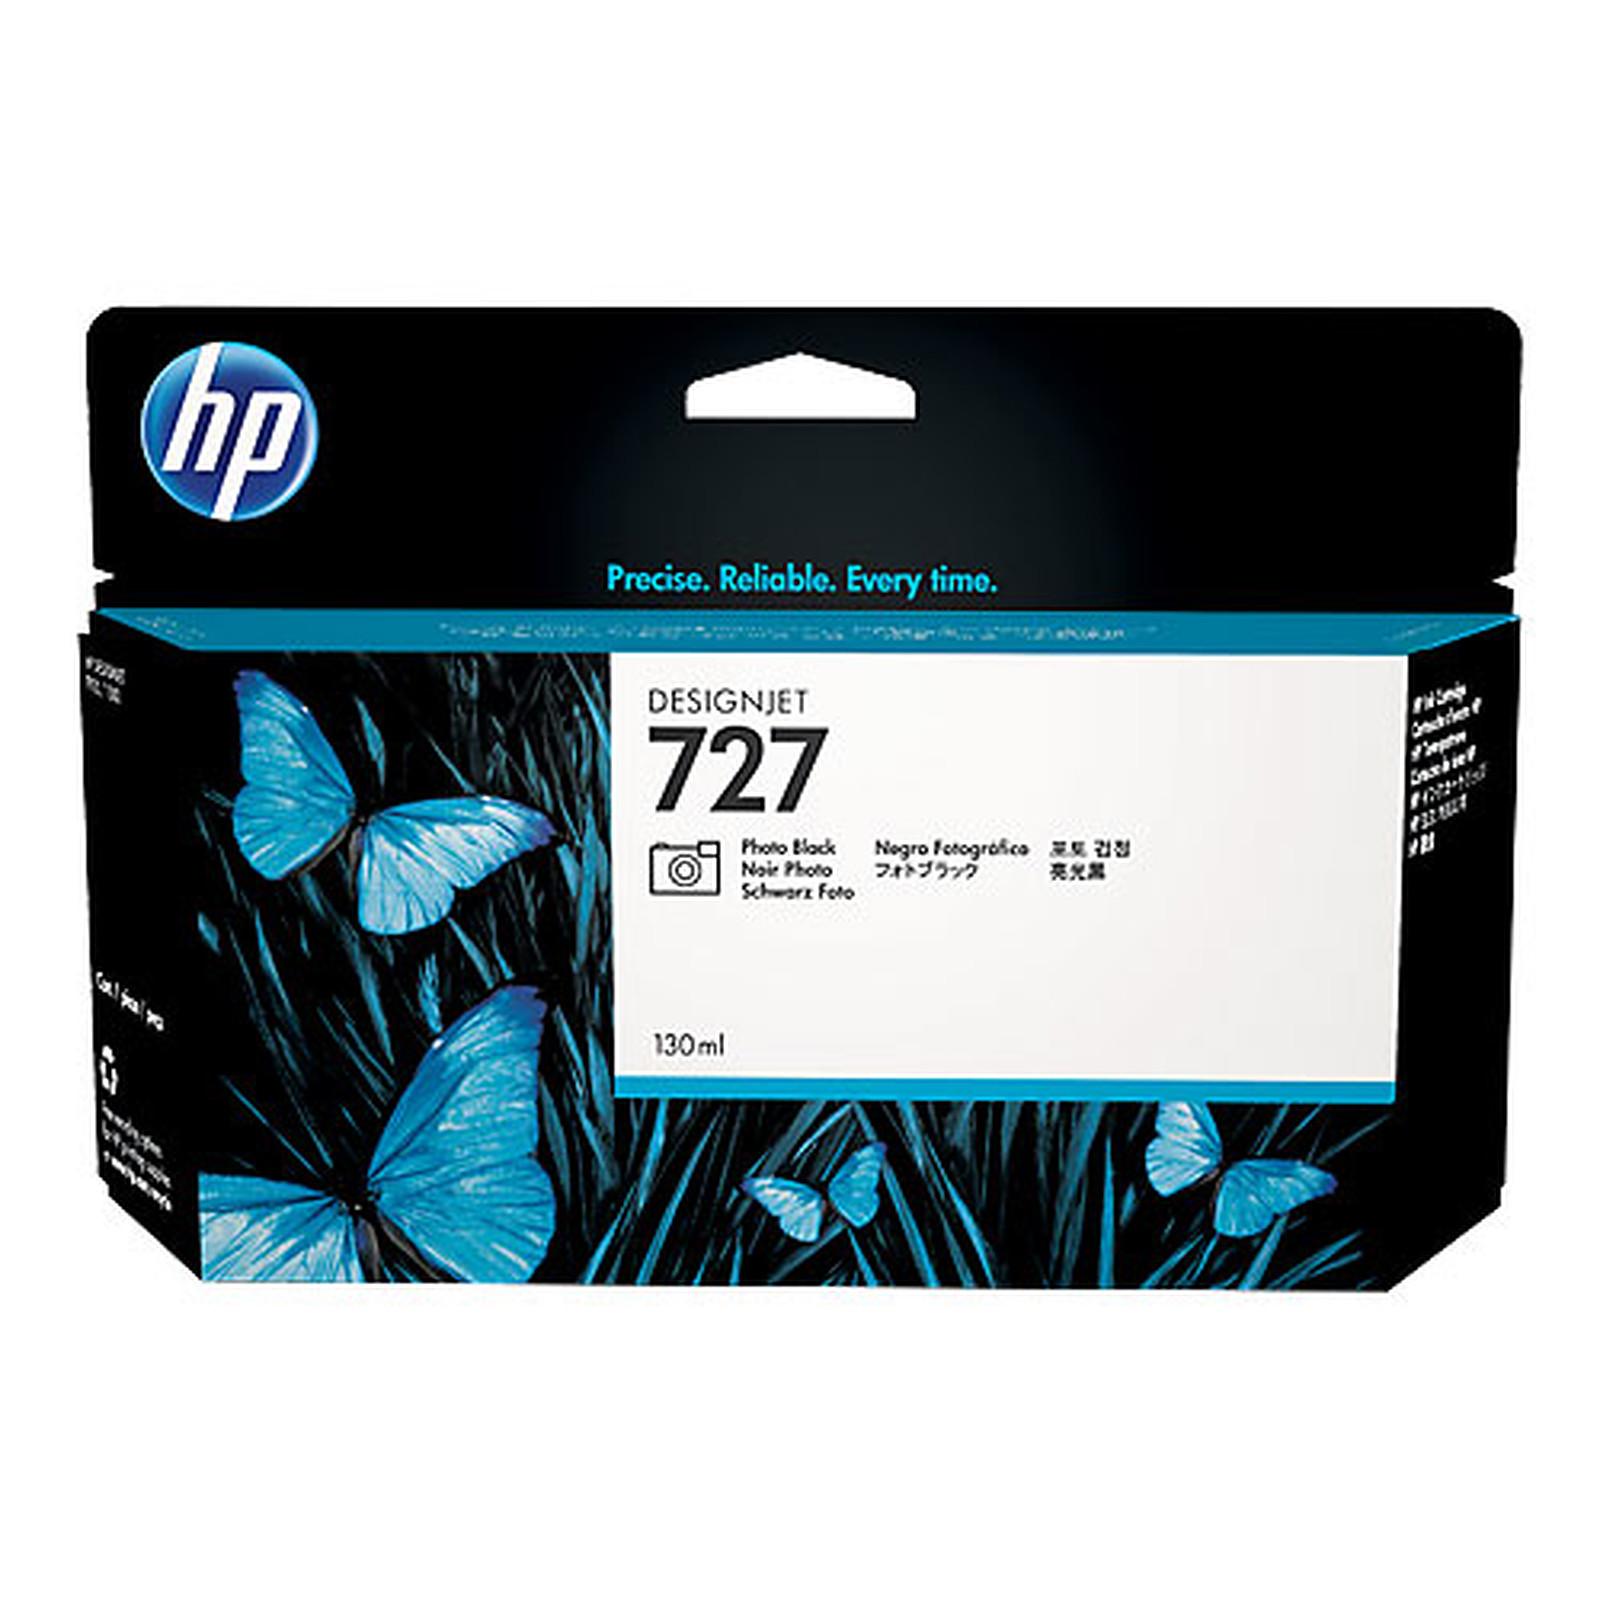 HP 727 Designjet 130 ml - Noir Photo